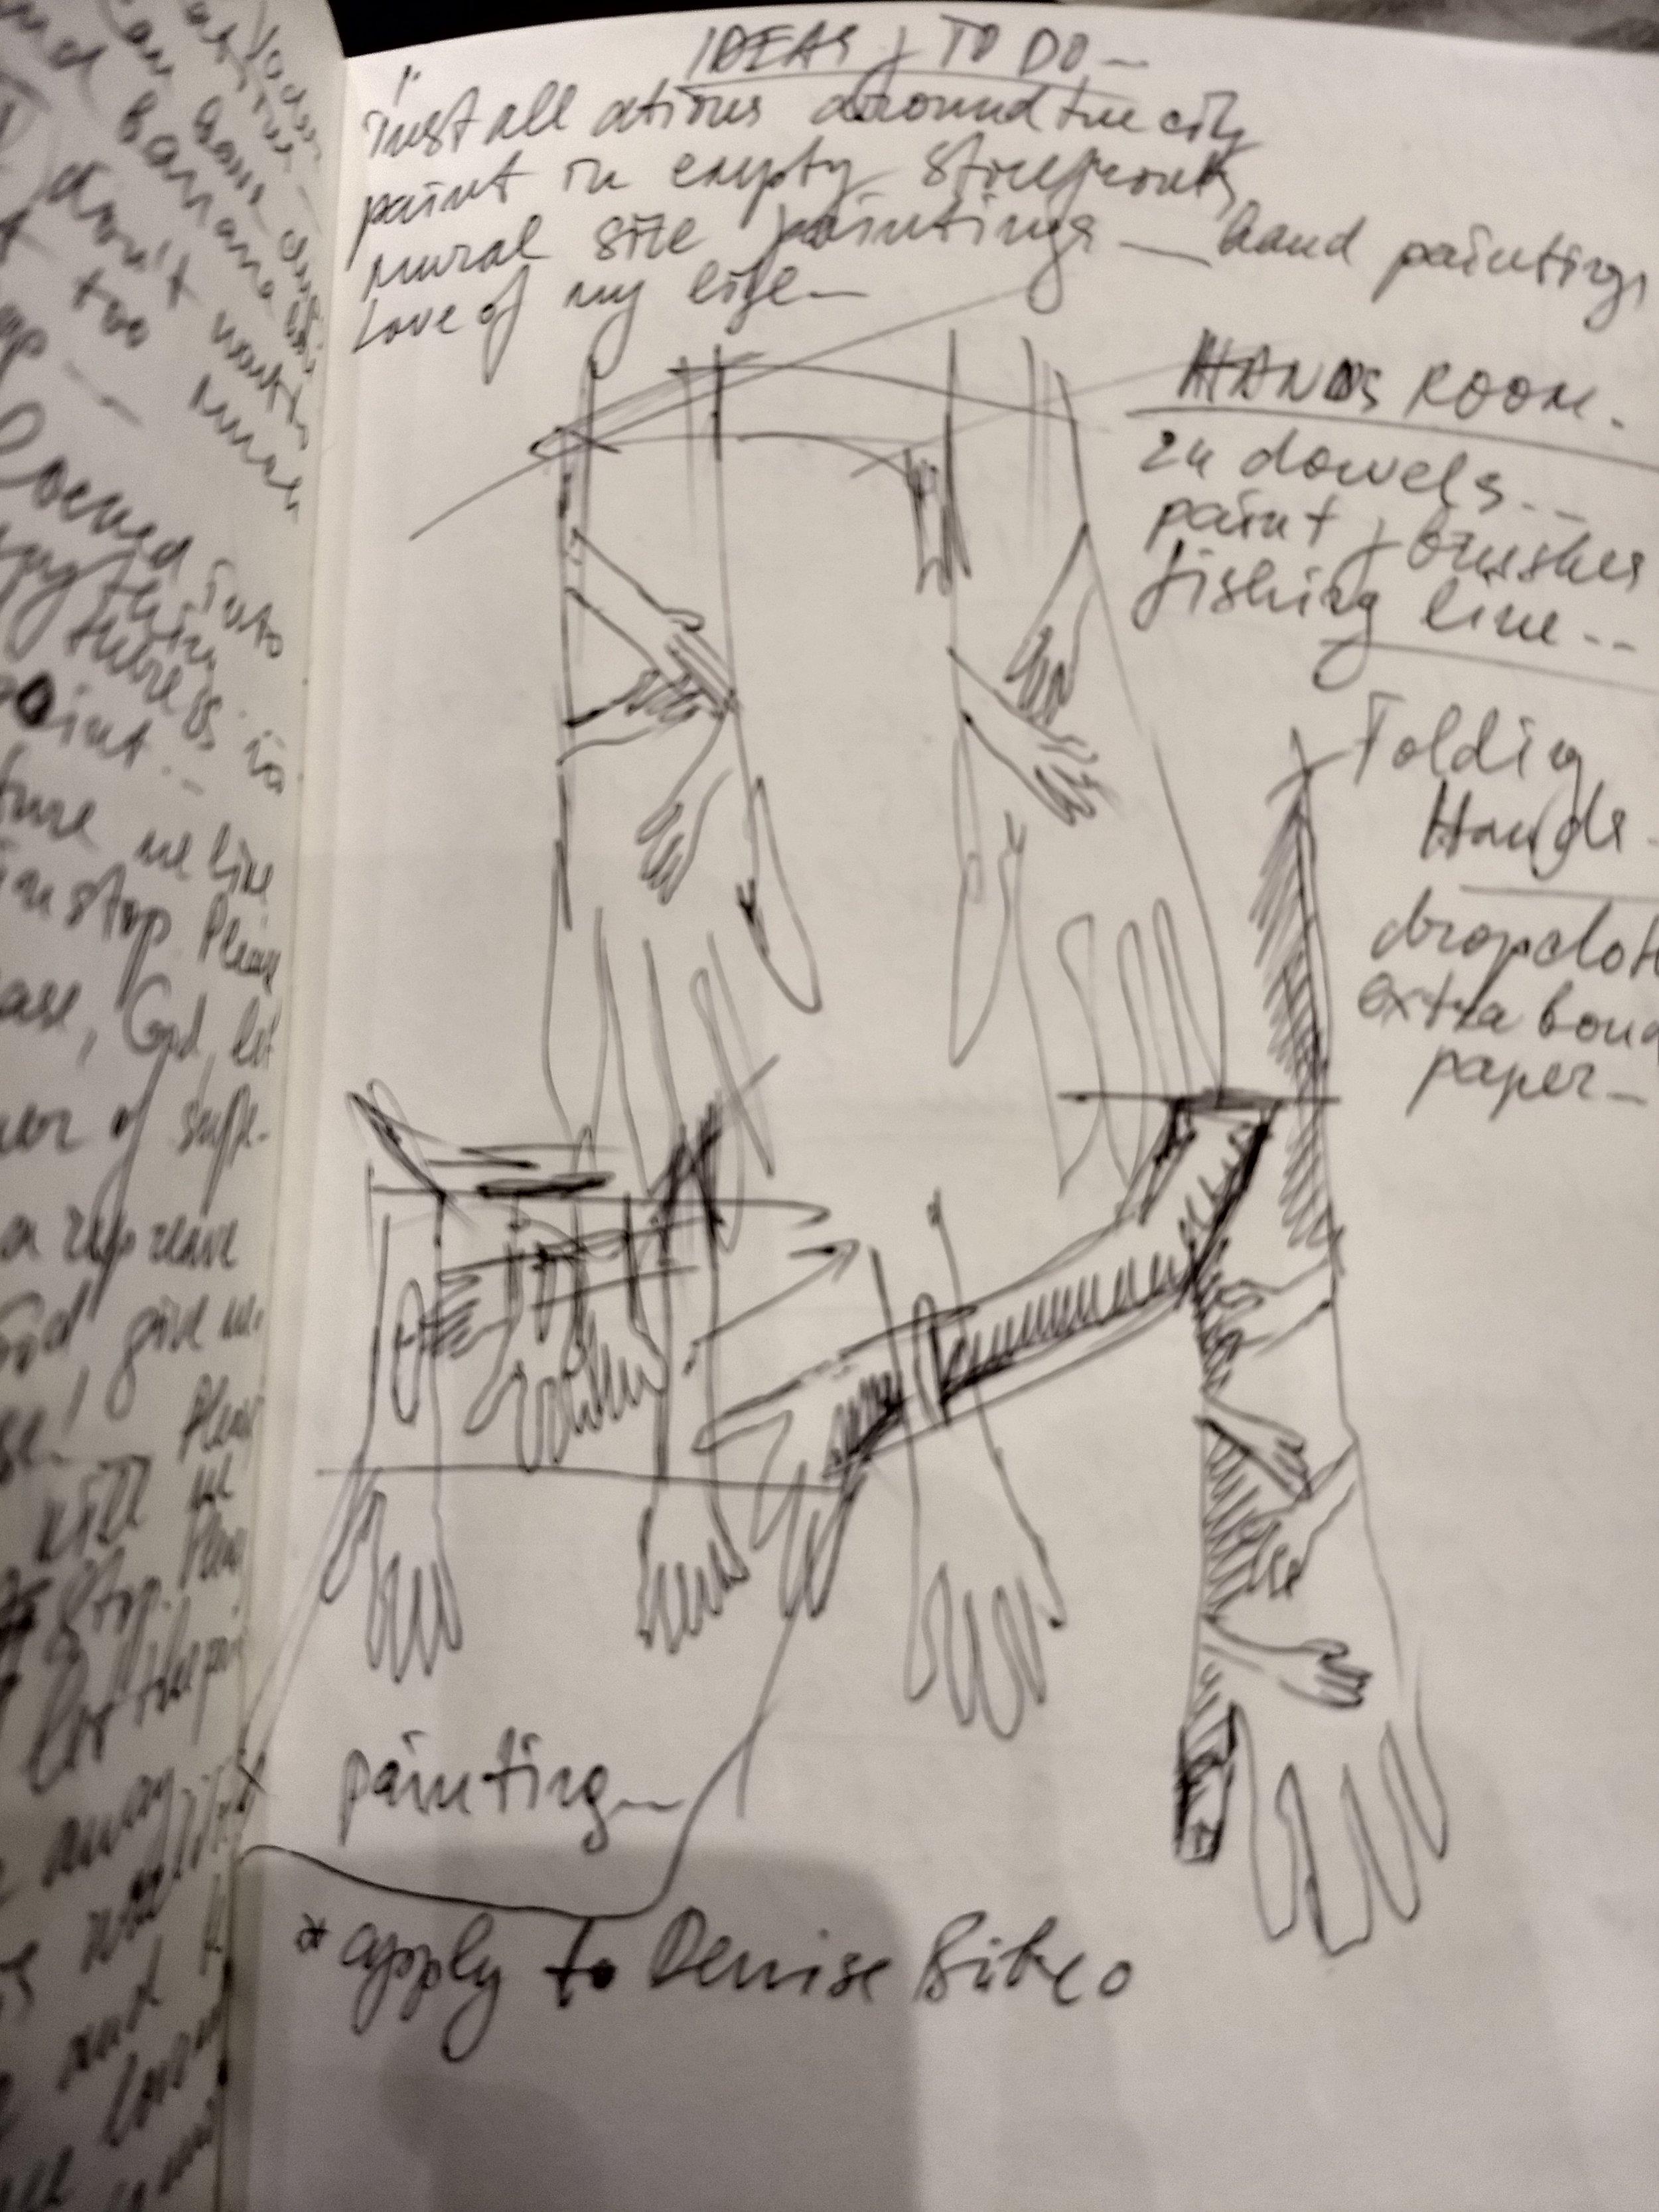 hands-tesseract-sketch-mirena-rhee_01.jpg